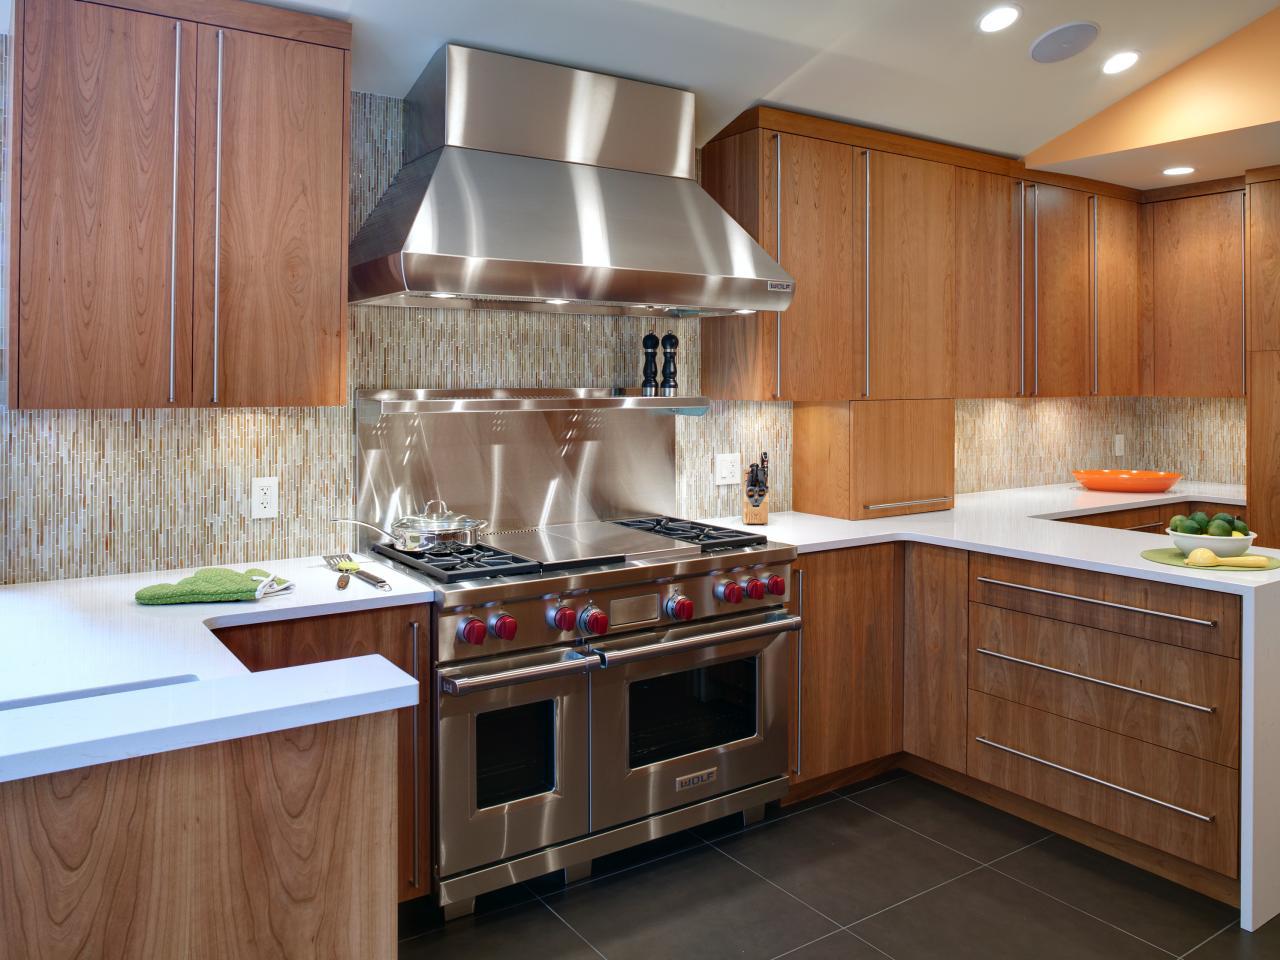 shaker kitchen cabinets 1958